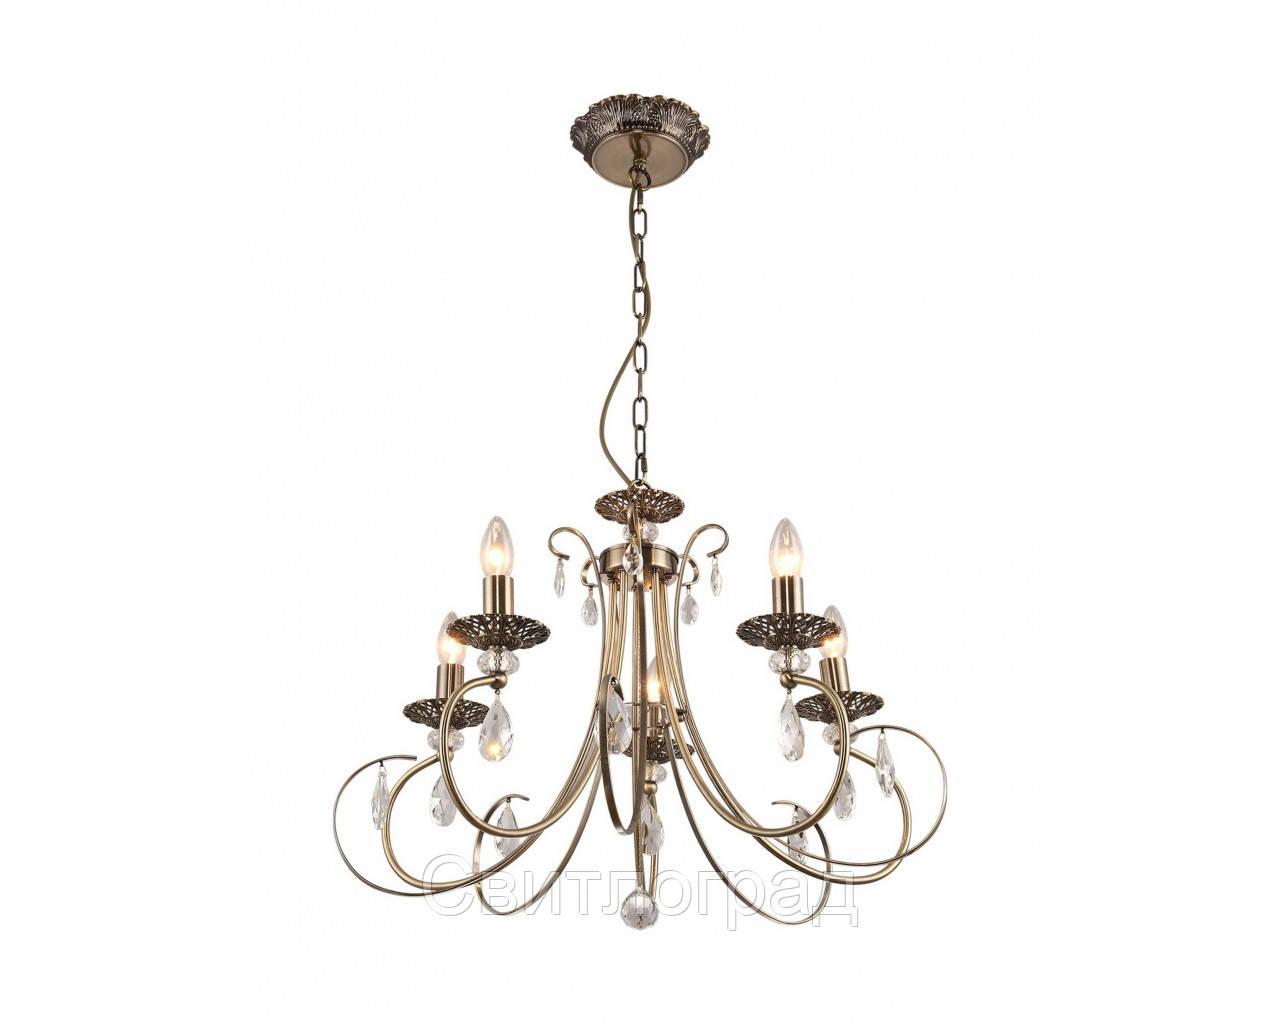 Люстра Свеча  Классика  Altalusse INL-1099Р-05 Antique Brass